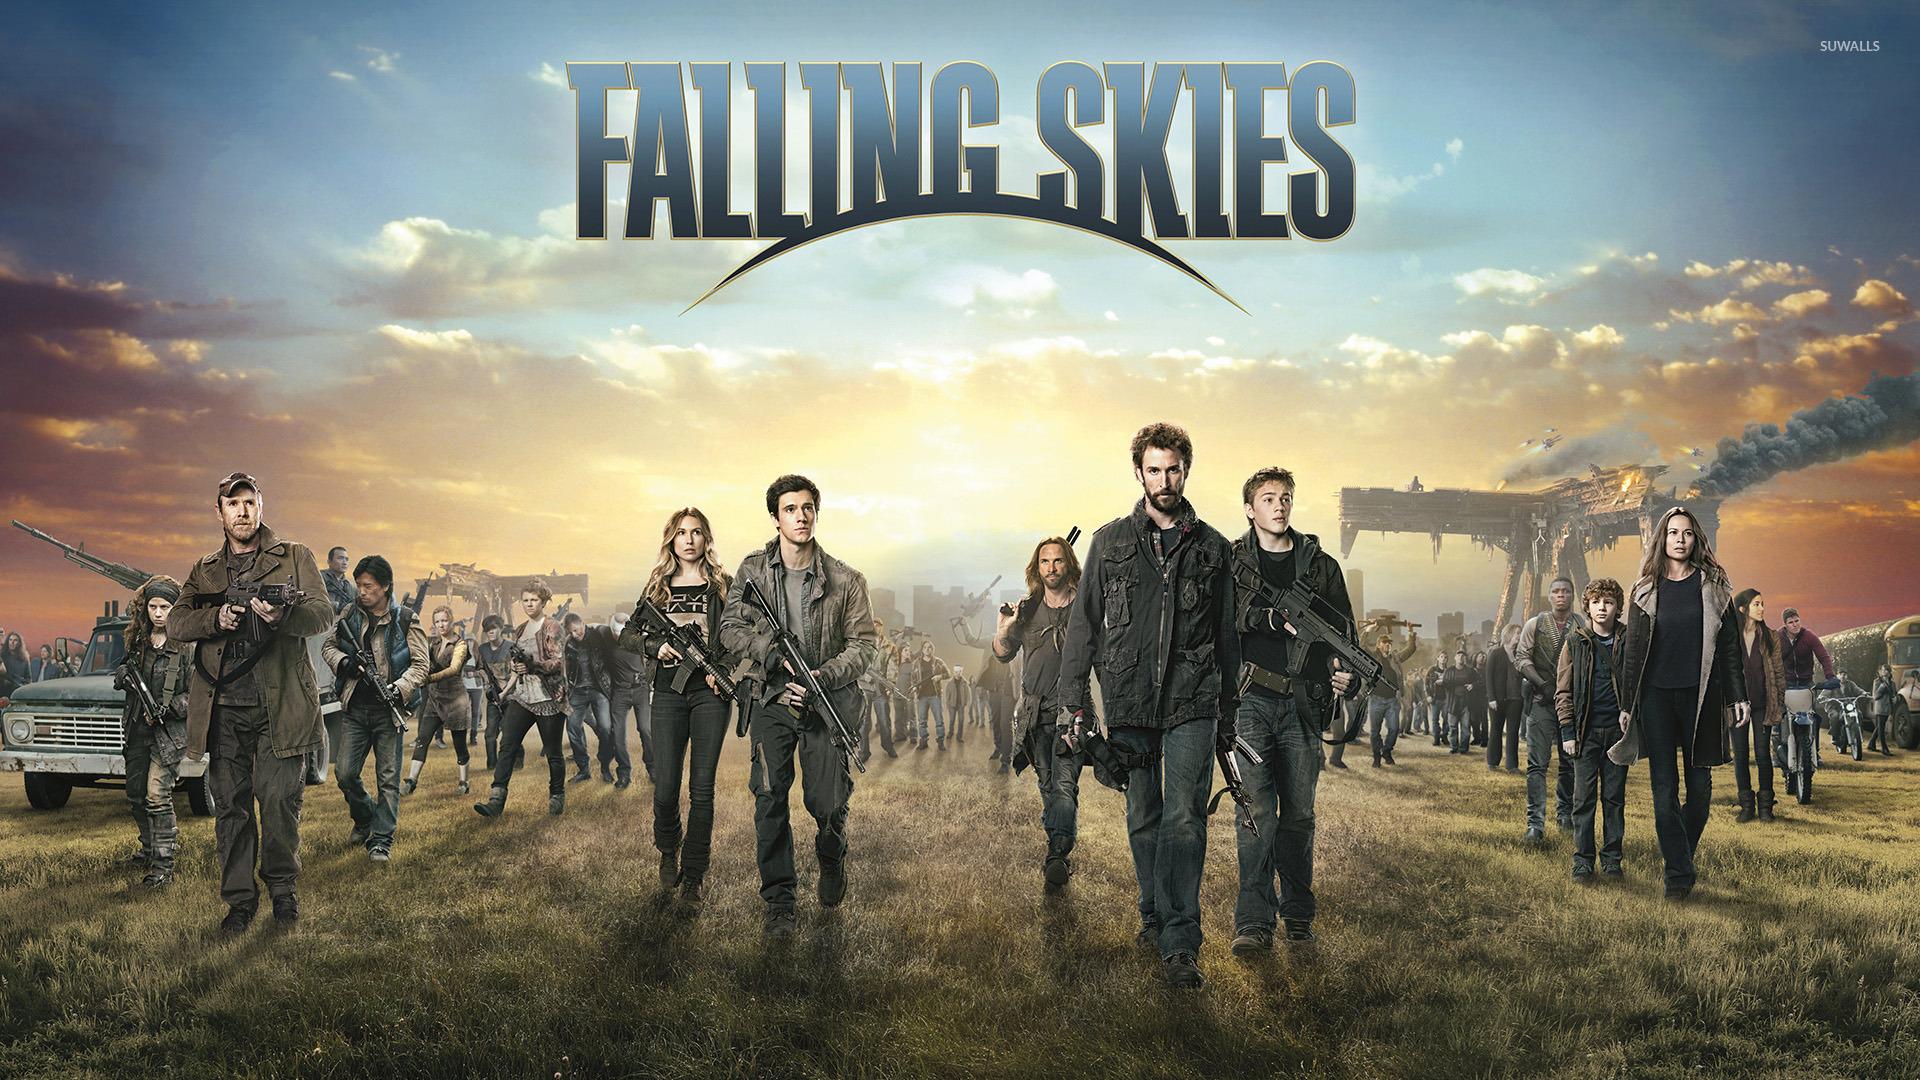 Falling Skies Wallpaper 1920x1080 Falling Skies Wallpaper Tv Show Wallpapers 29425